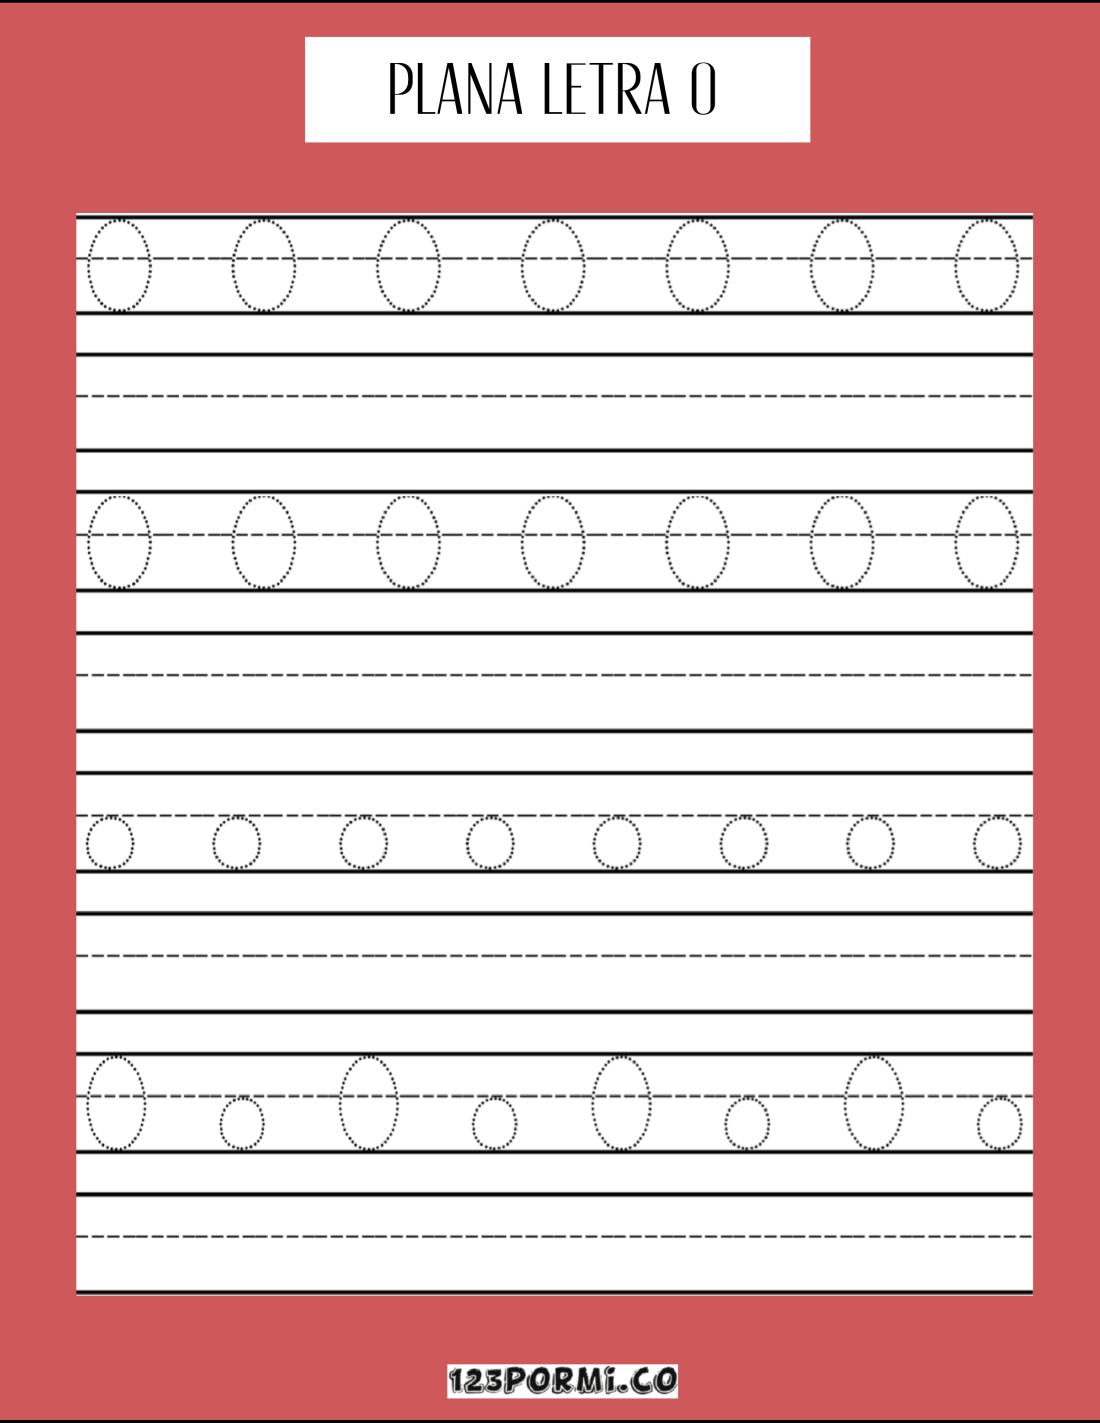 Plana letra O_Mesa de trabajo 1